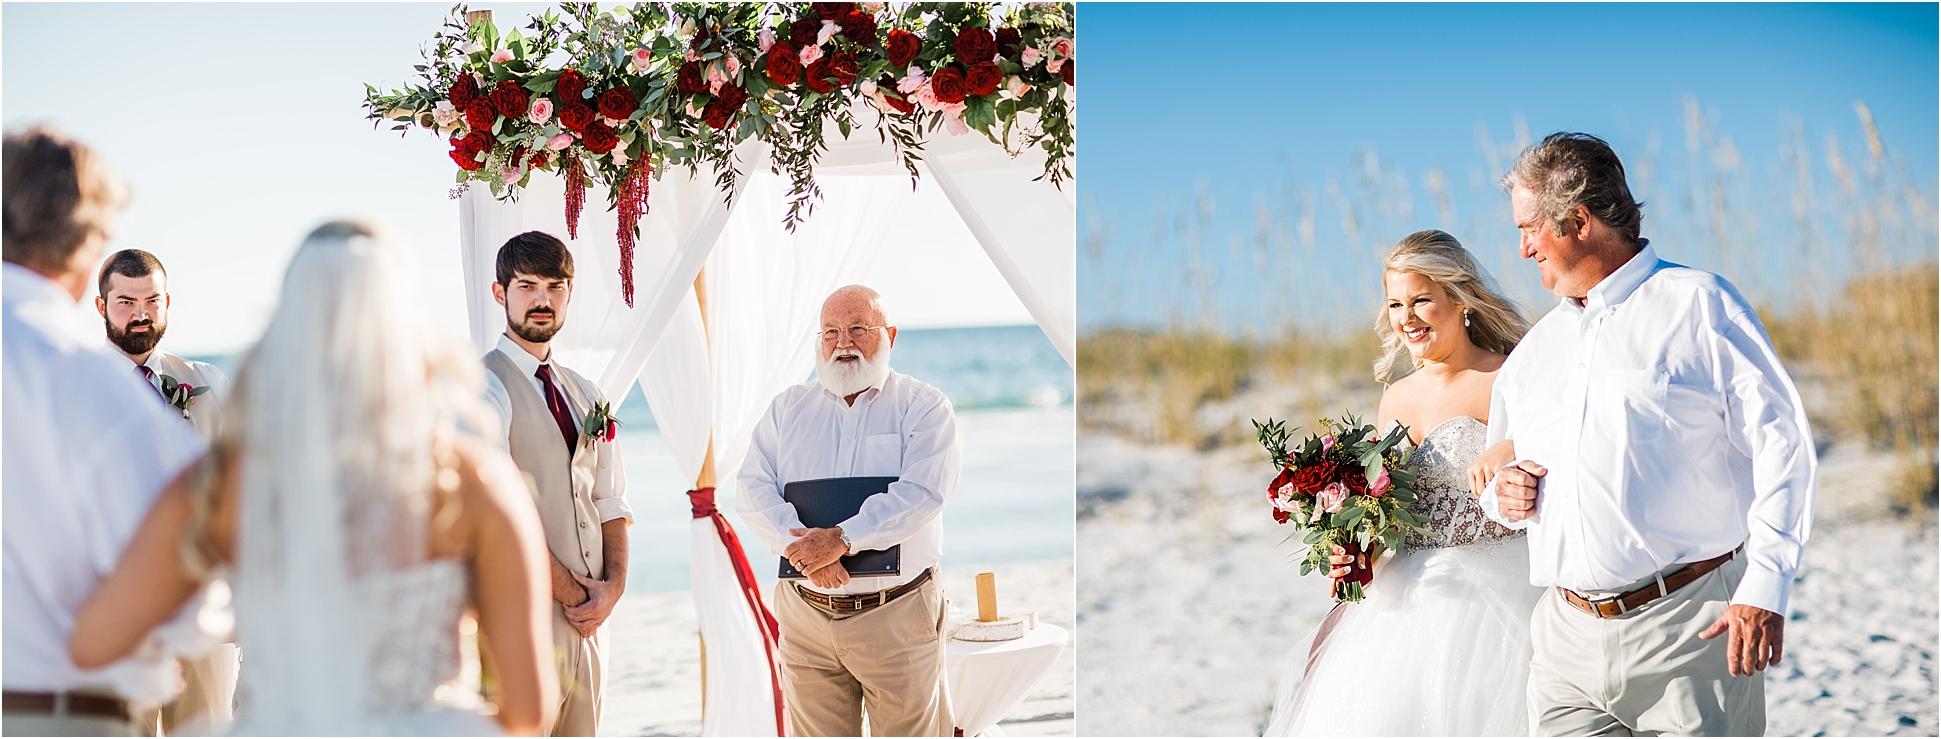 Small Beach Weddings